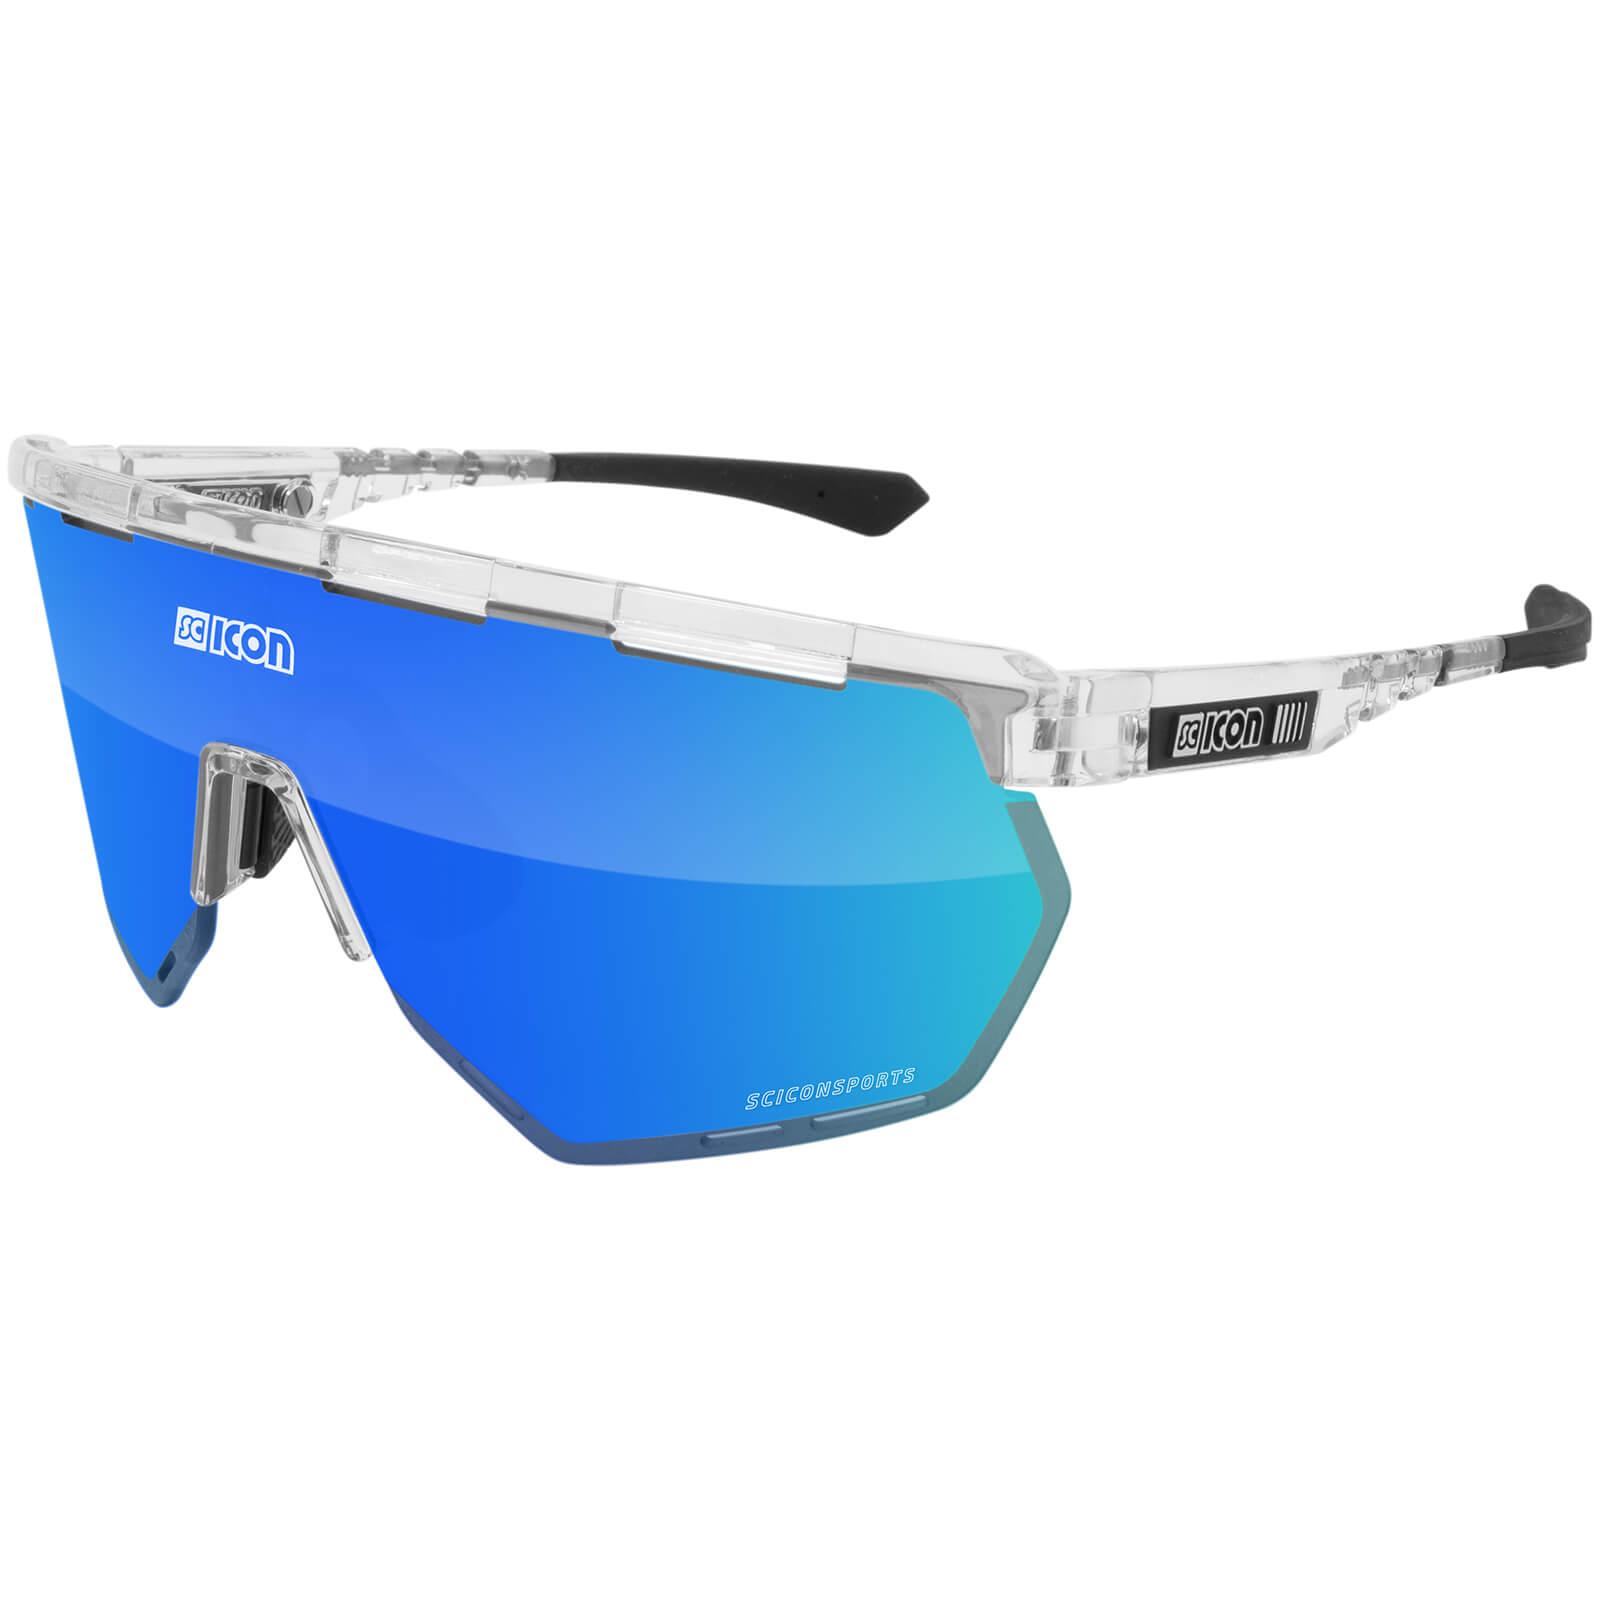 Scicon Aerowing Road Sunglasses - Crystal Gloss/SCNPP Multimirror Blue